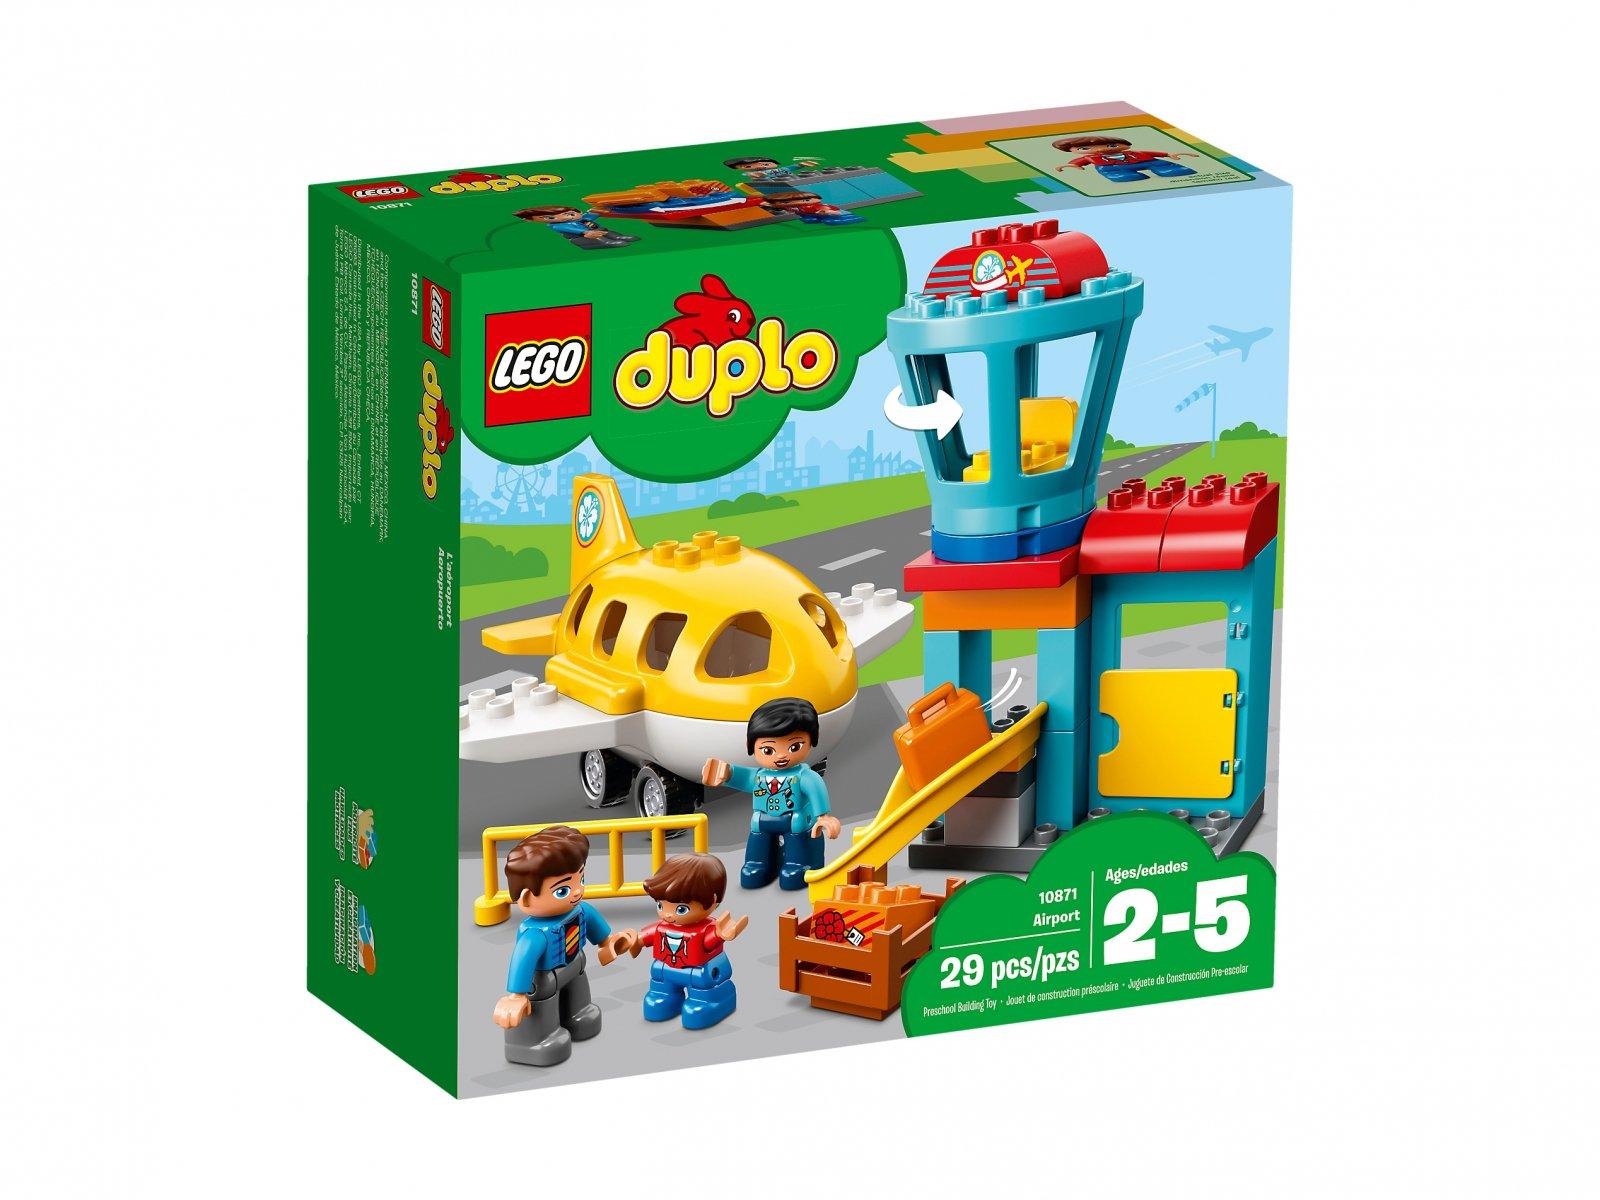 LEGO 10871 Duplo® Lotnisko